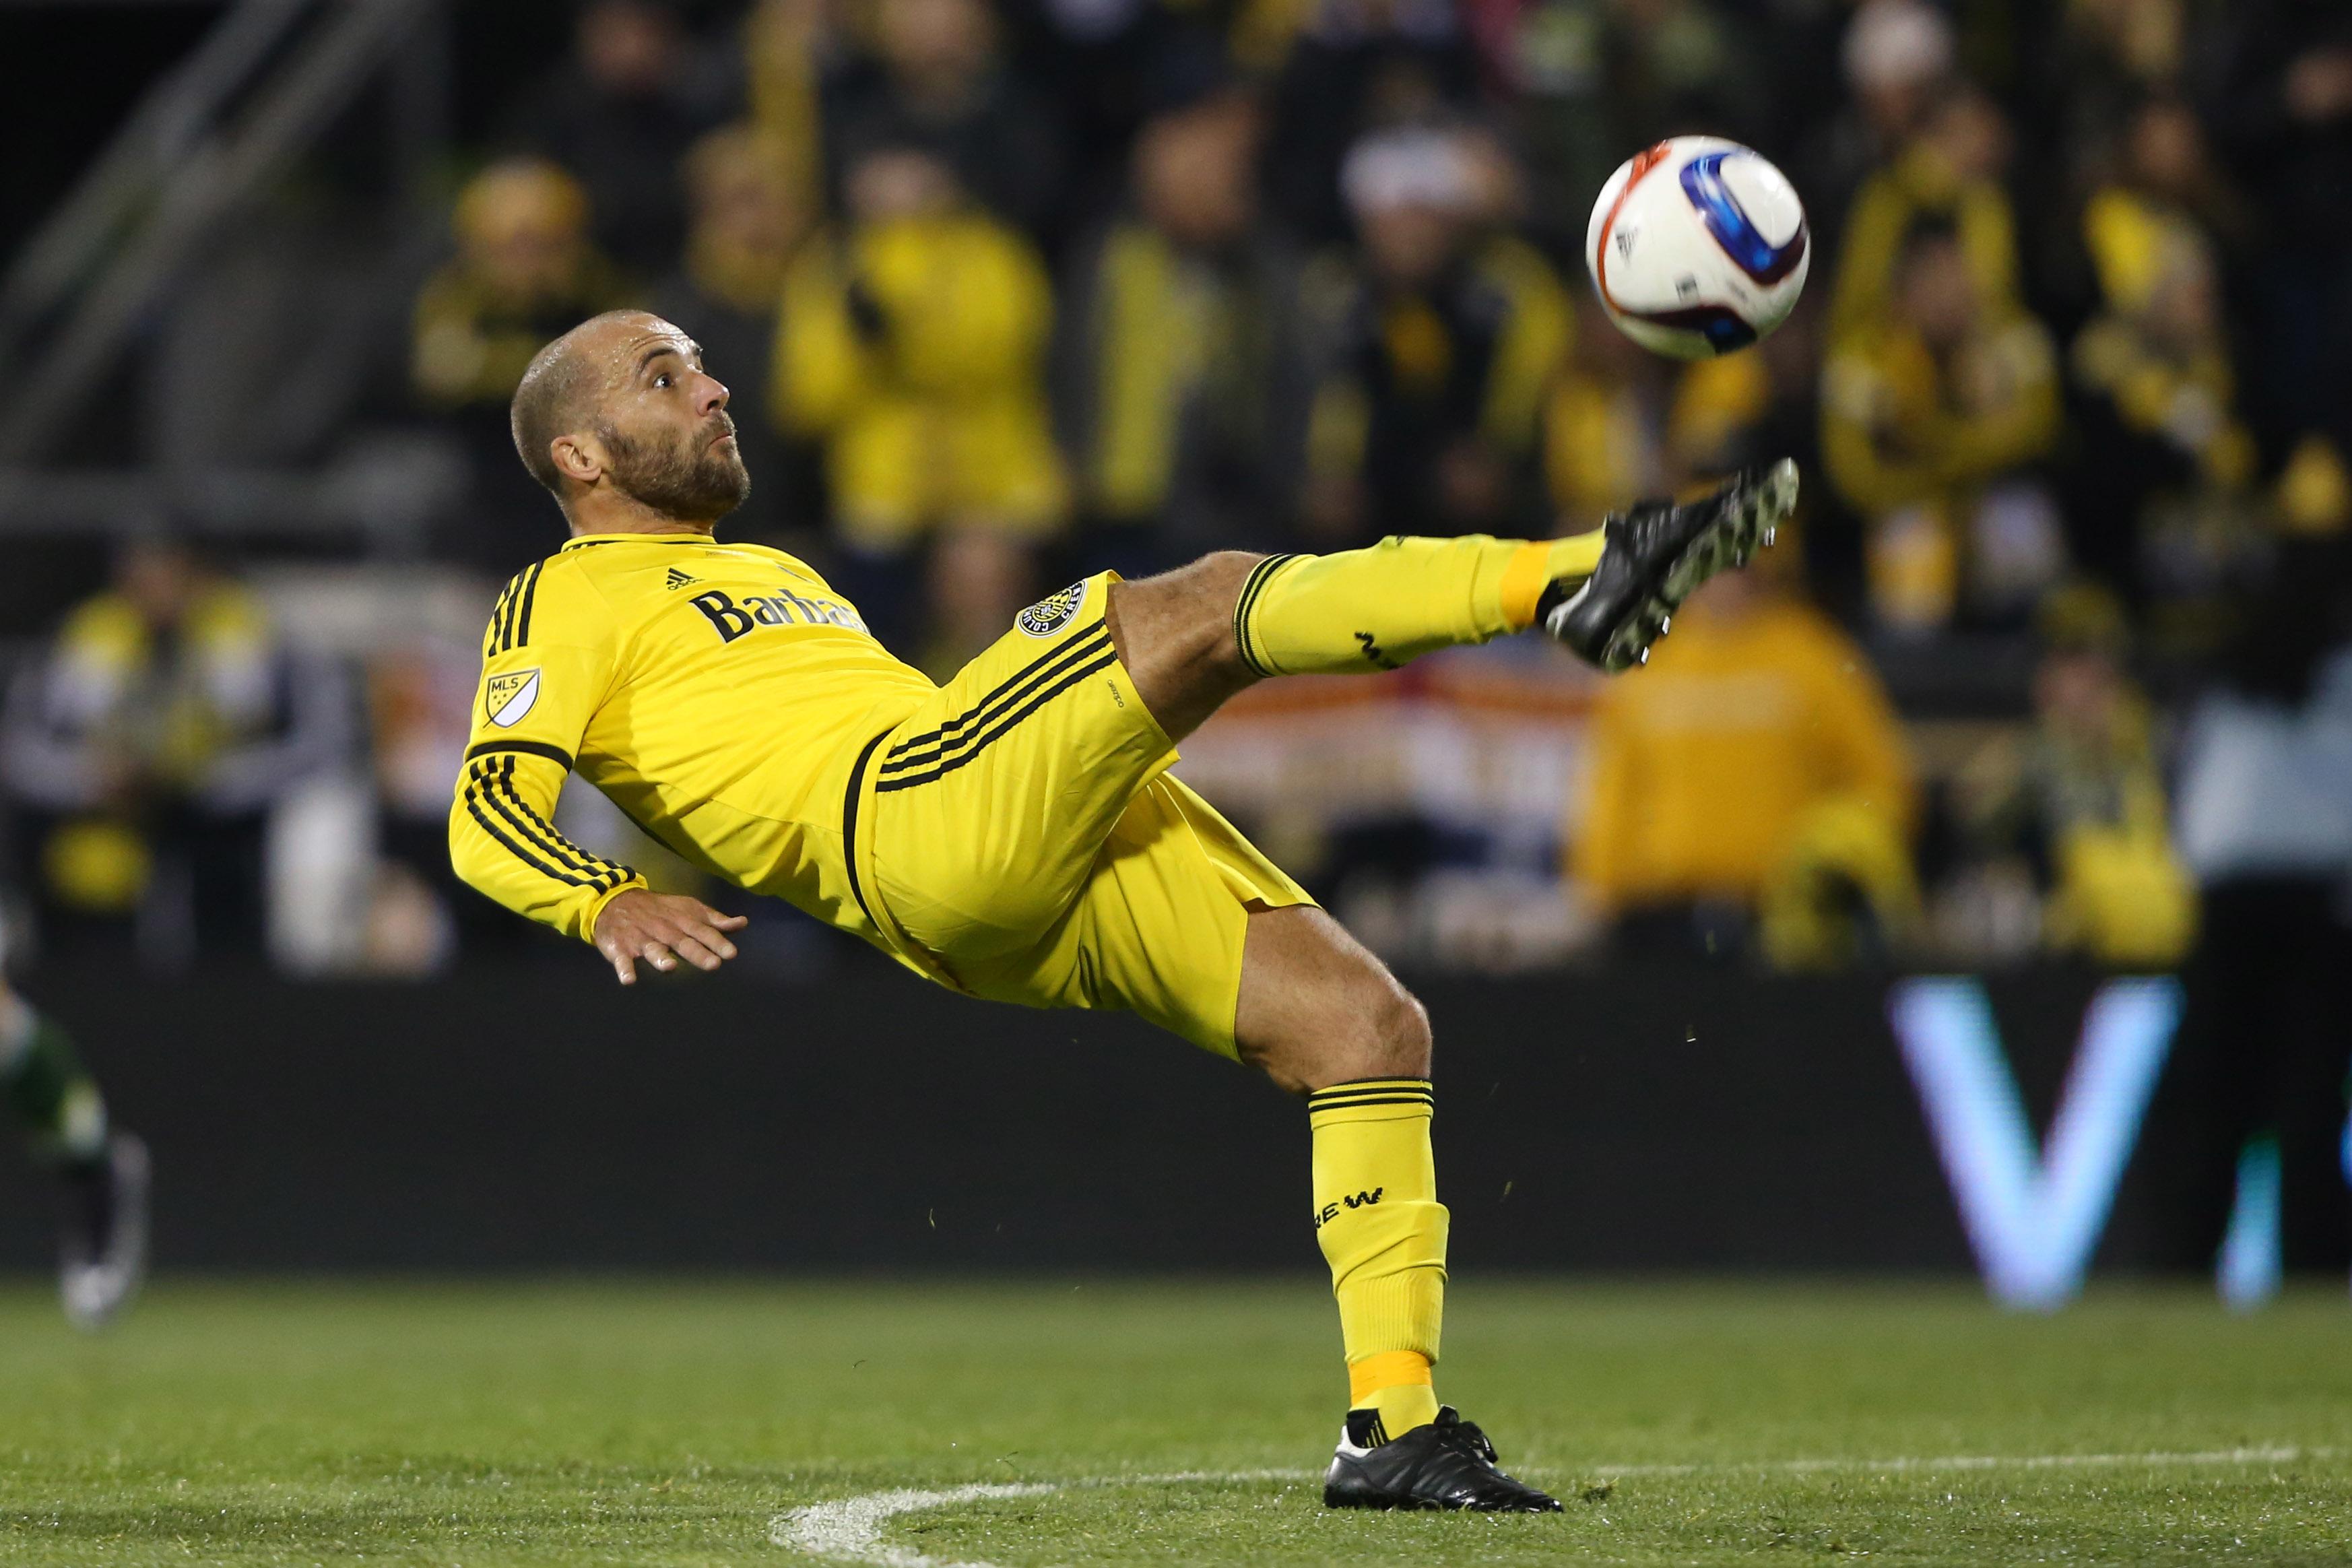 SOCCER: DEC 06 MLS Cup - Timbers at Crew SC